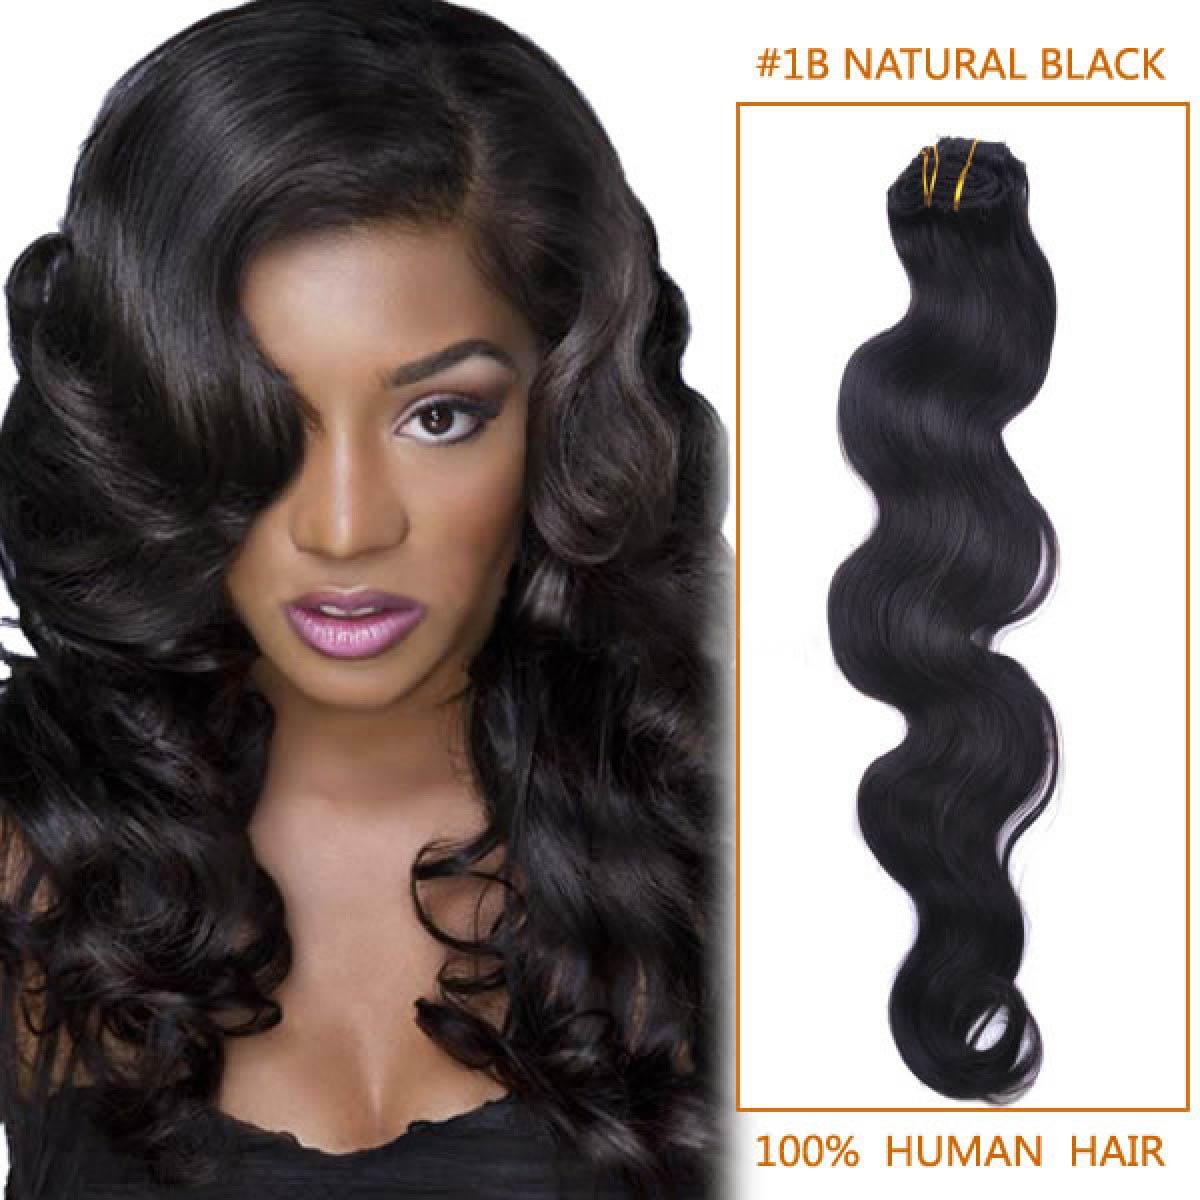 16 inch 1b natural black body wave brazilian virgin hair wefts solutioingenieria Choice Image